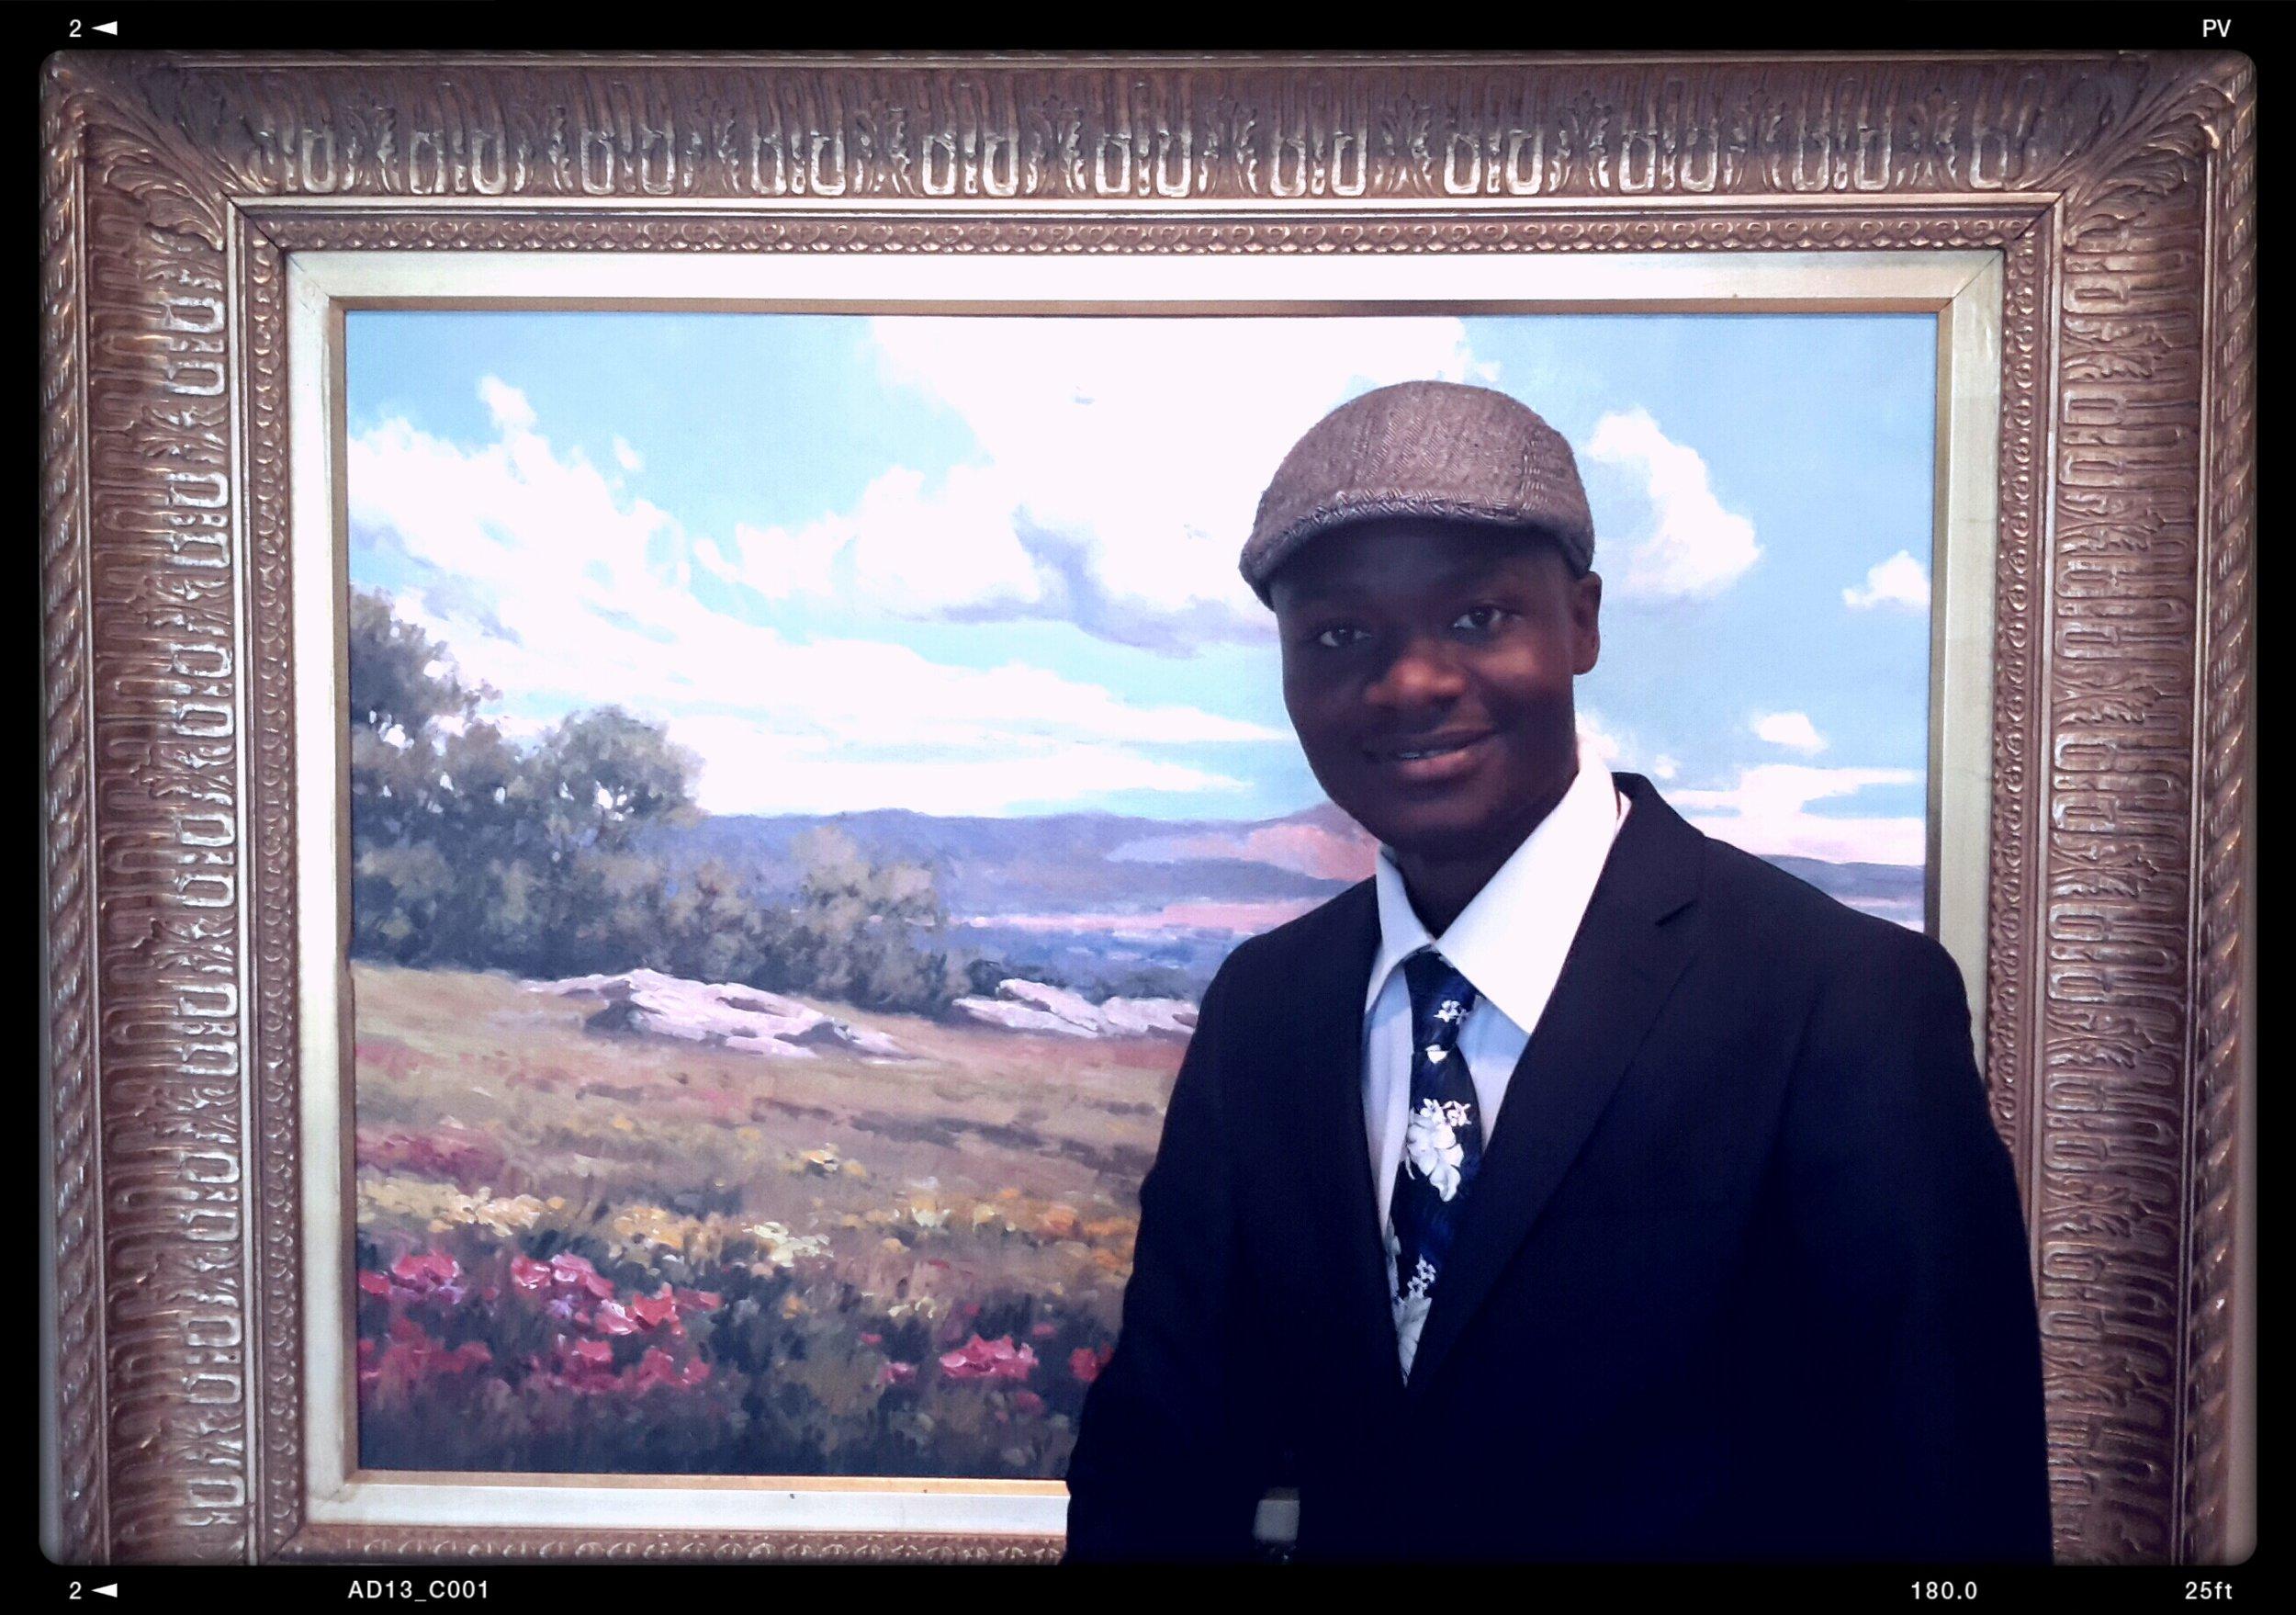 Willice Onyango